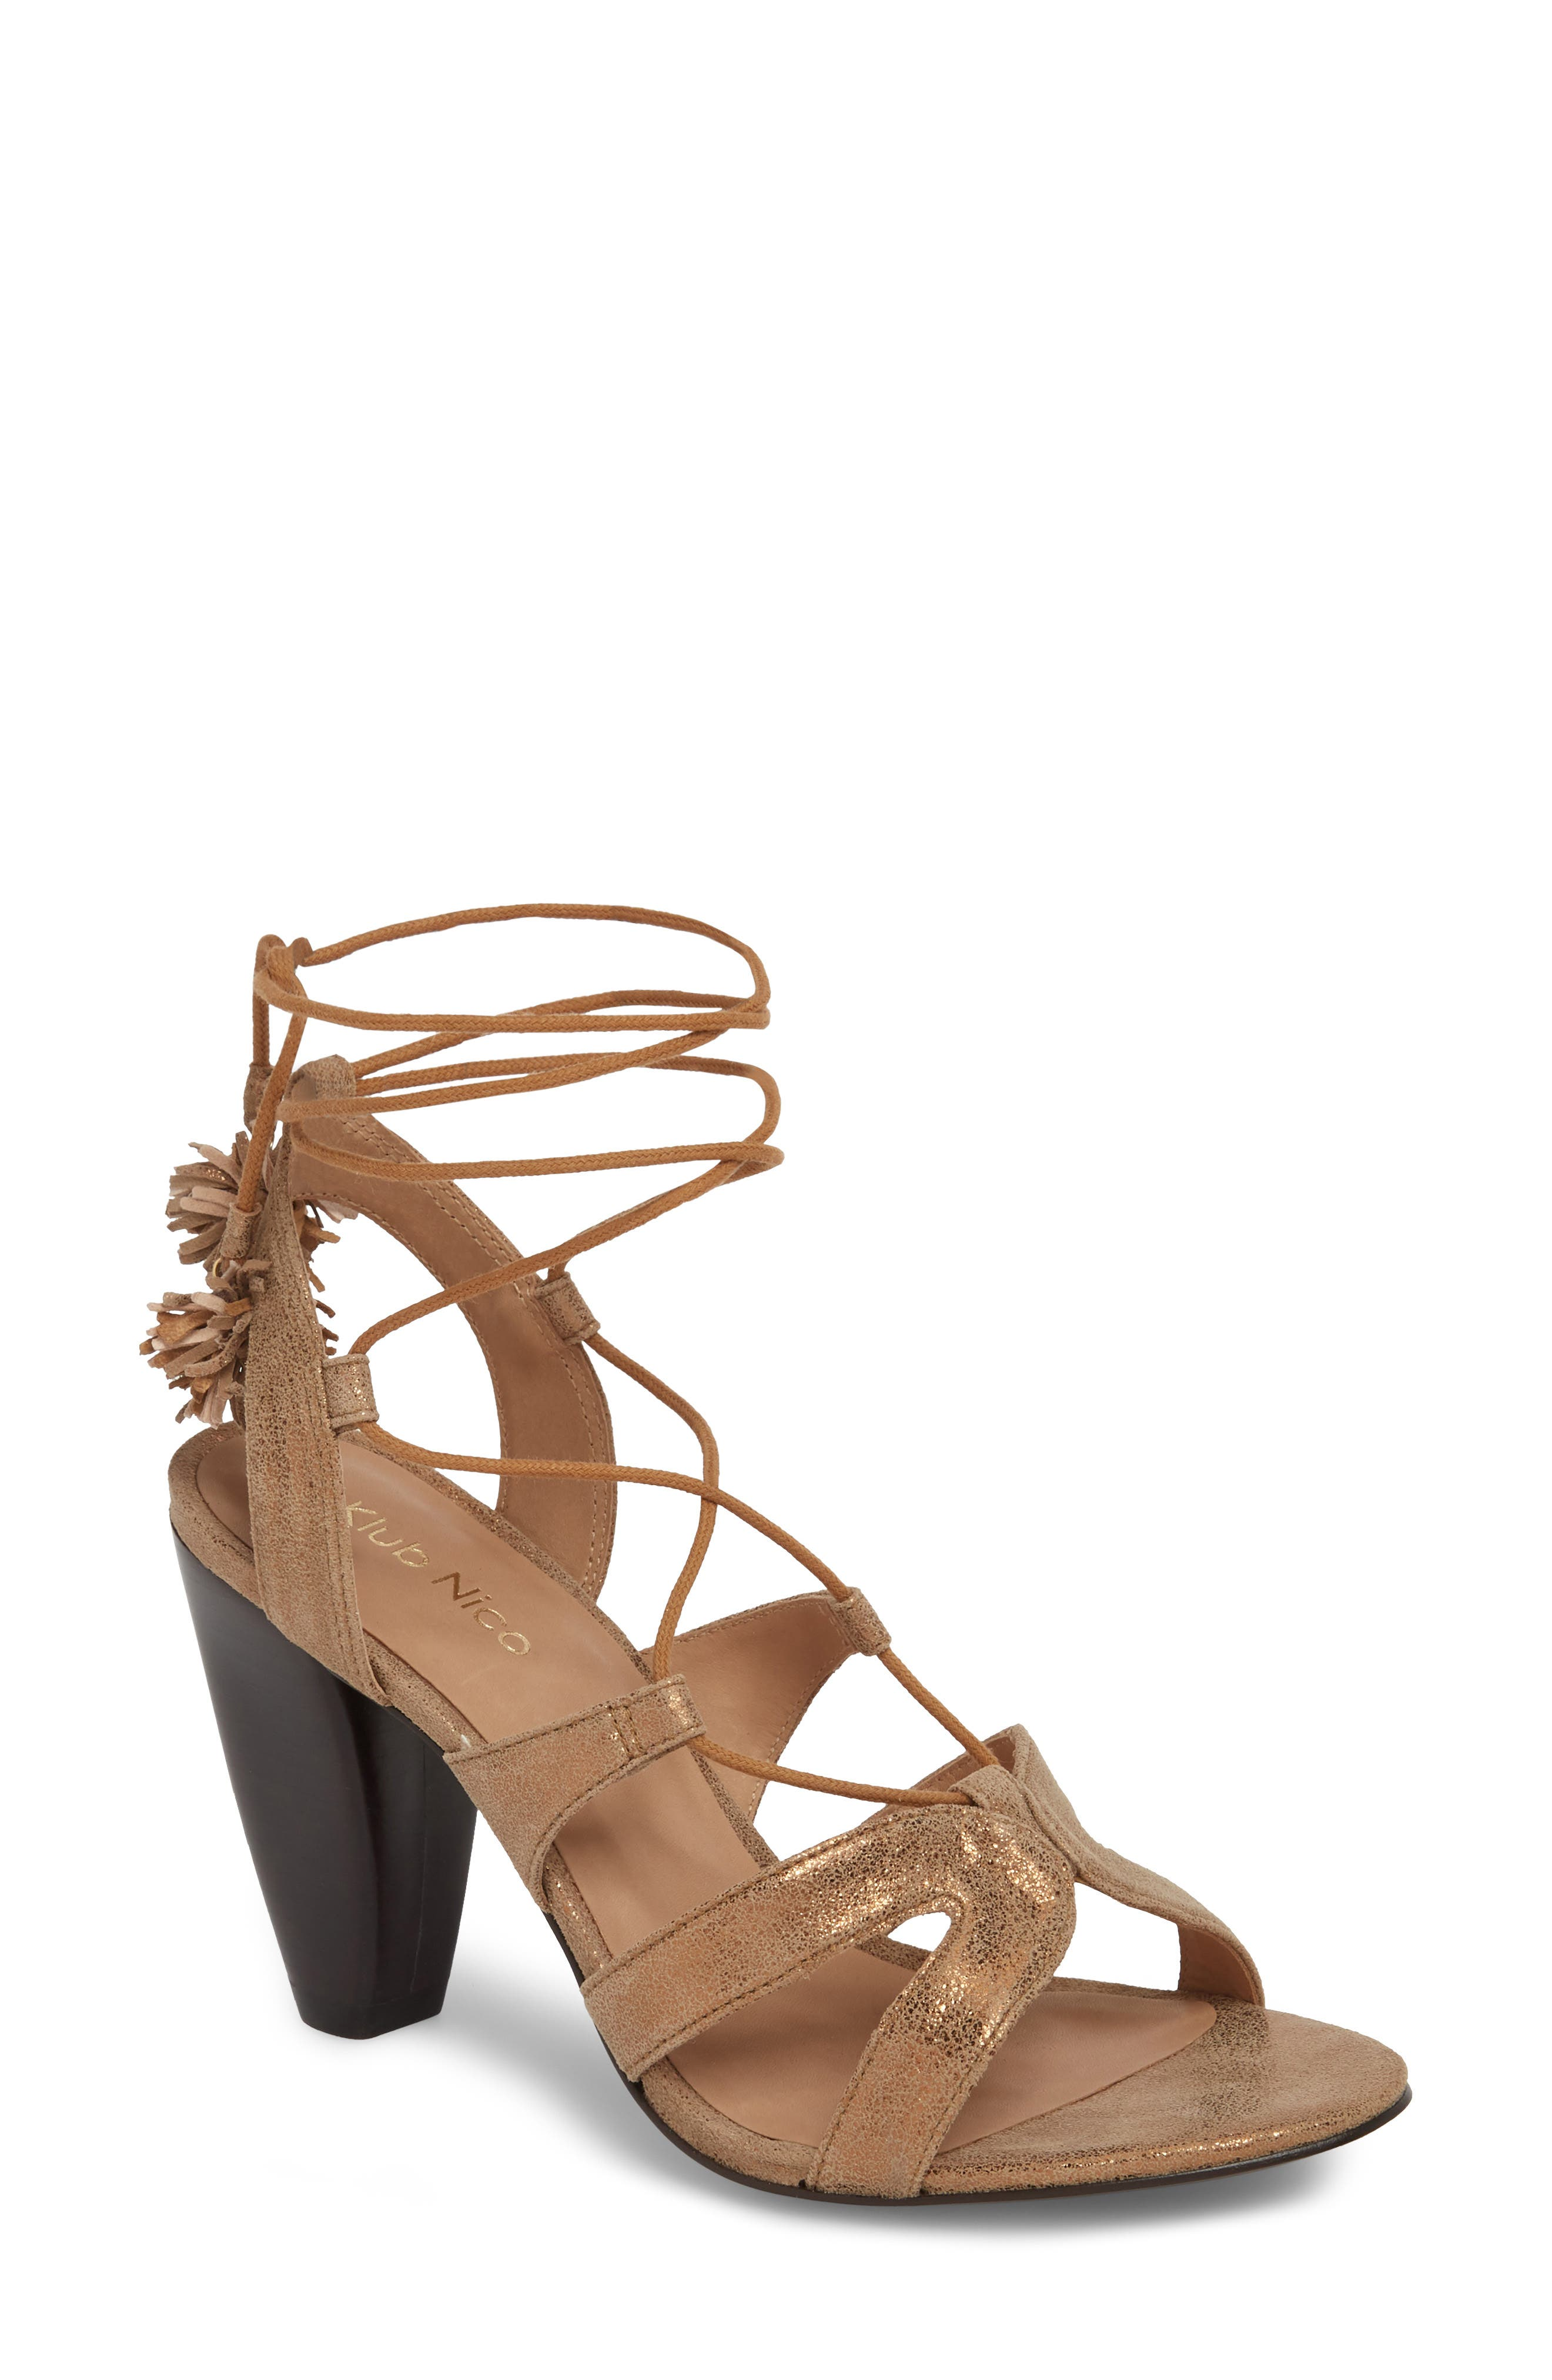 Maxine Sandal,                         Main,                         color, Bronze Suede